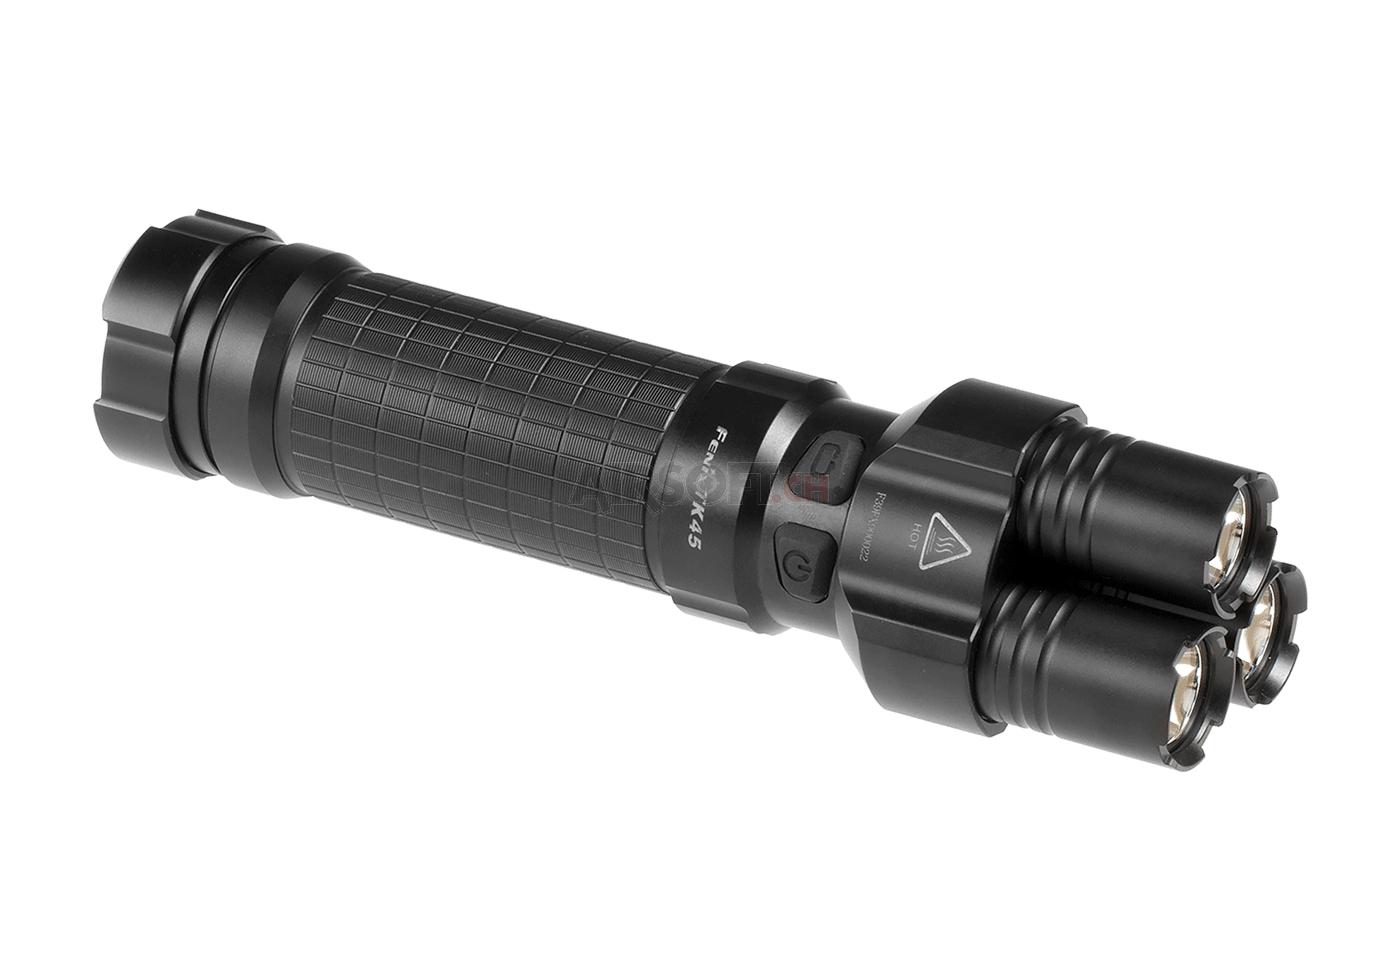 TK45 XP-G R5 (Fenix) - Flashlights - Equipment